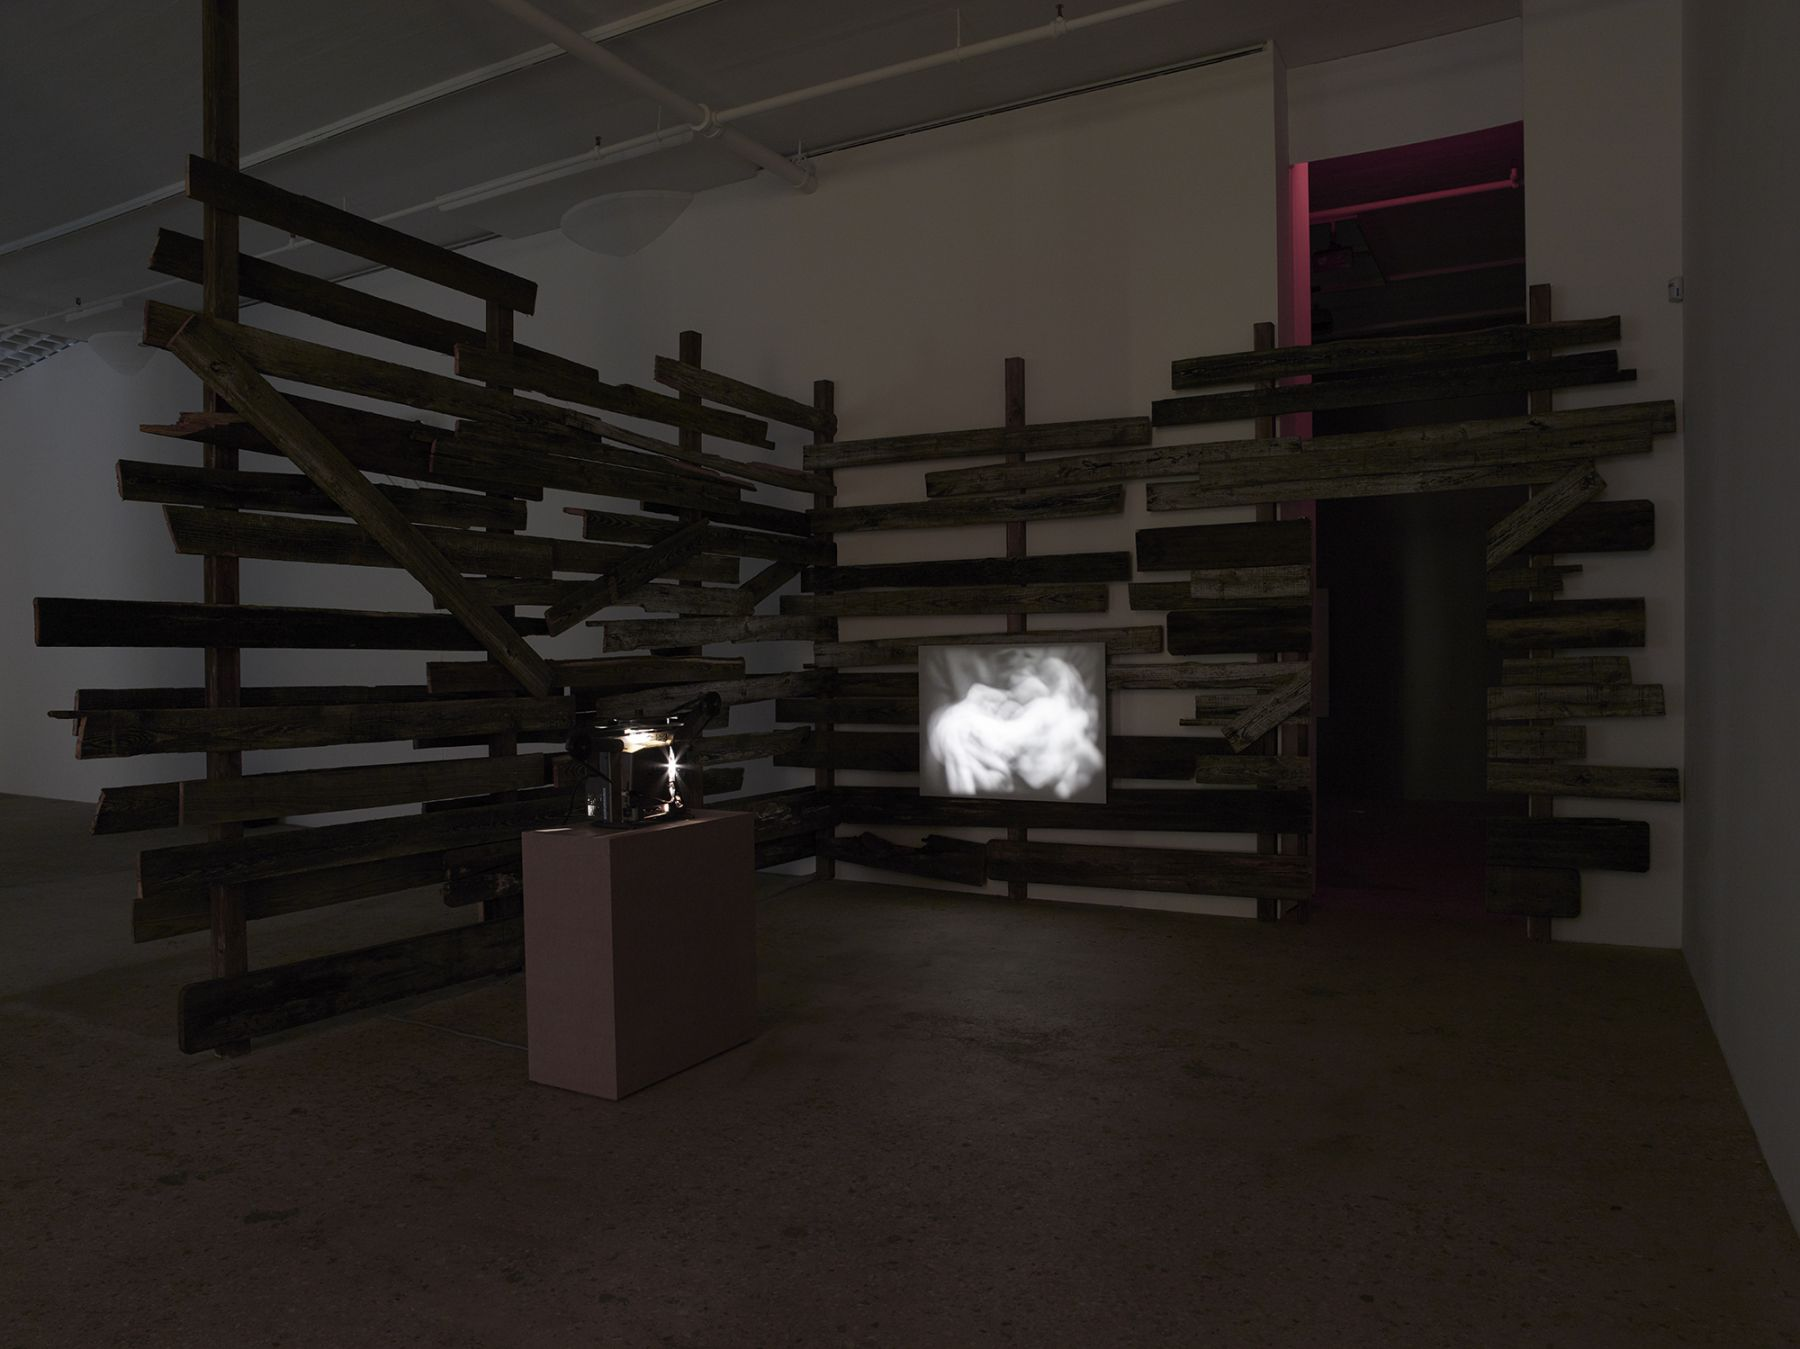 Installation view, Body Electric, Greene Naftali, New York, 2015